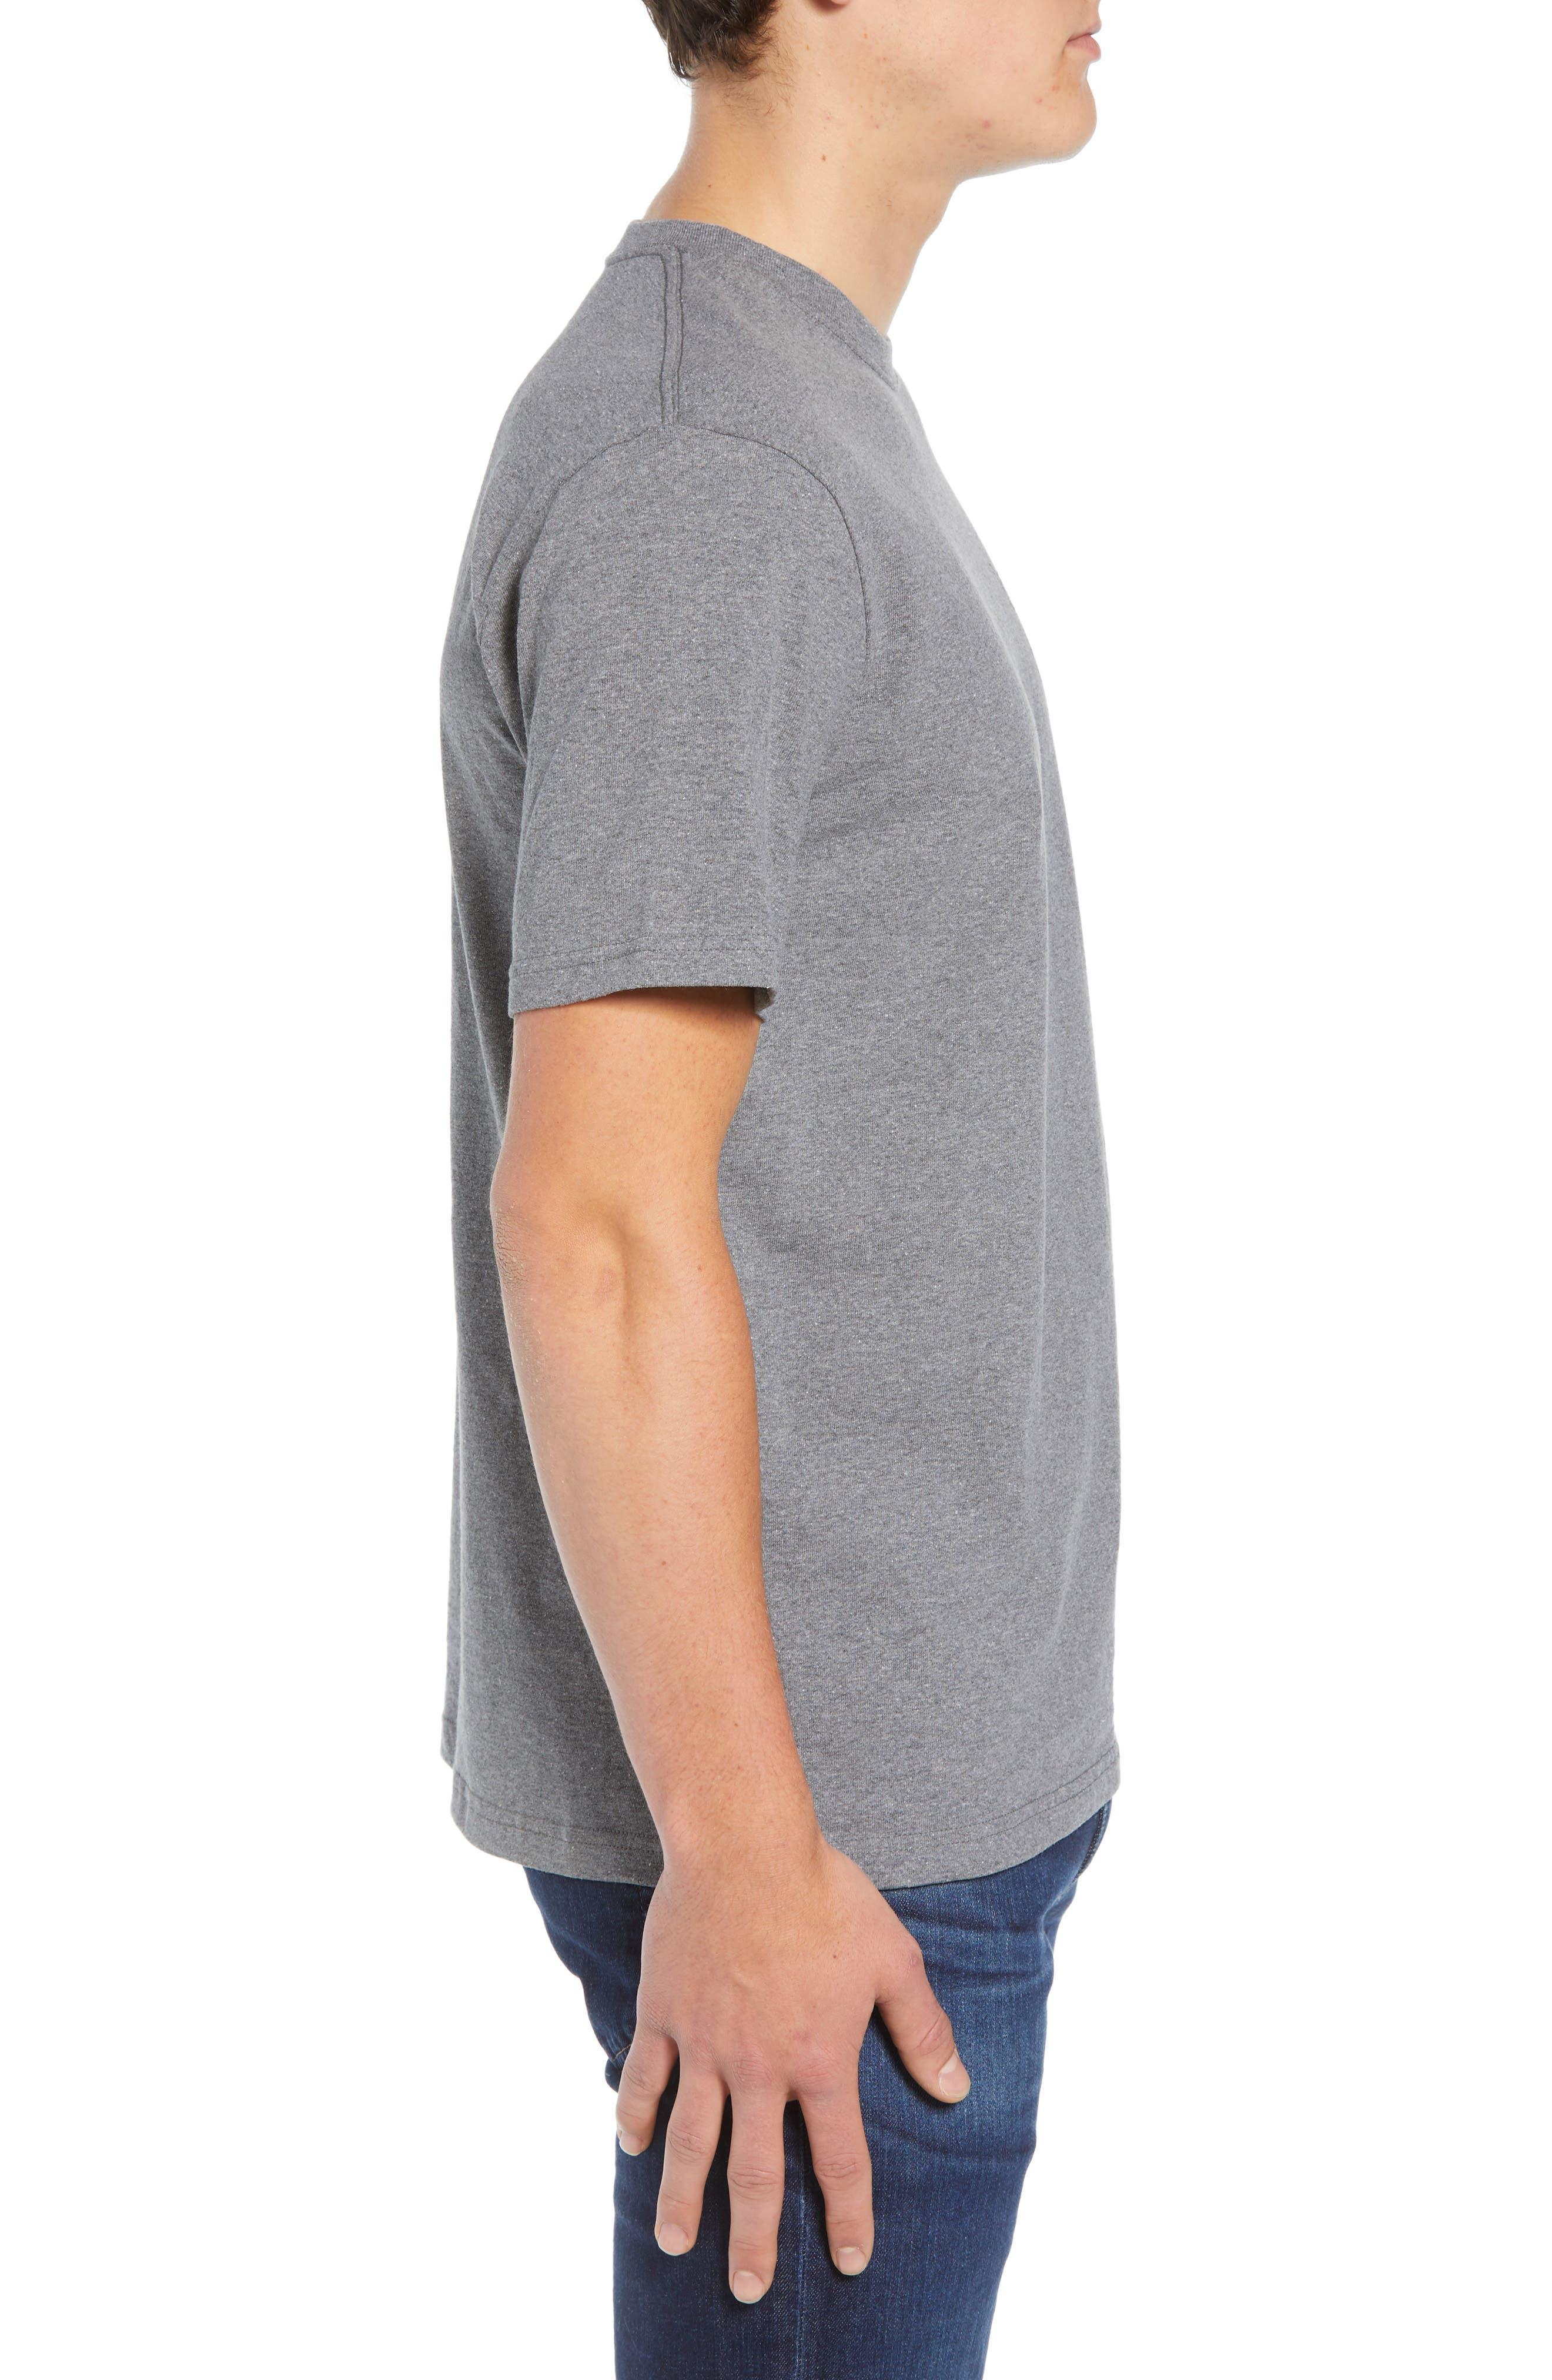 Shaka Wave Slim Fit T-Shirt,                             Alternate thumbnail 3, color,                             GRAVEL HEATHER